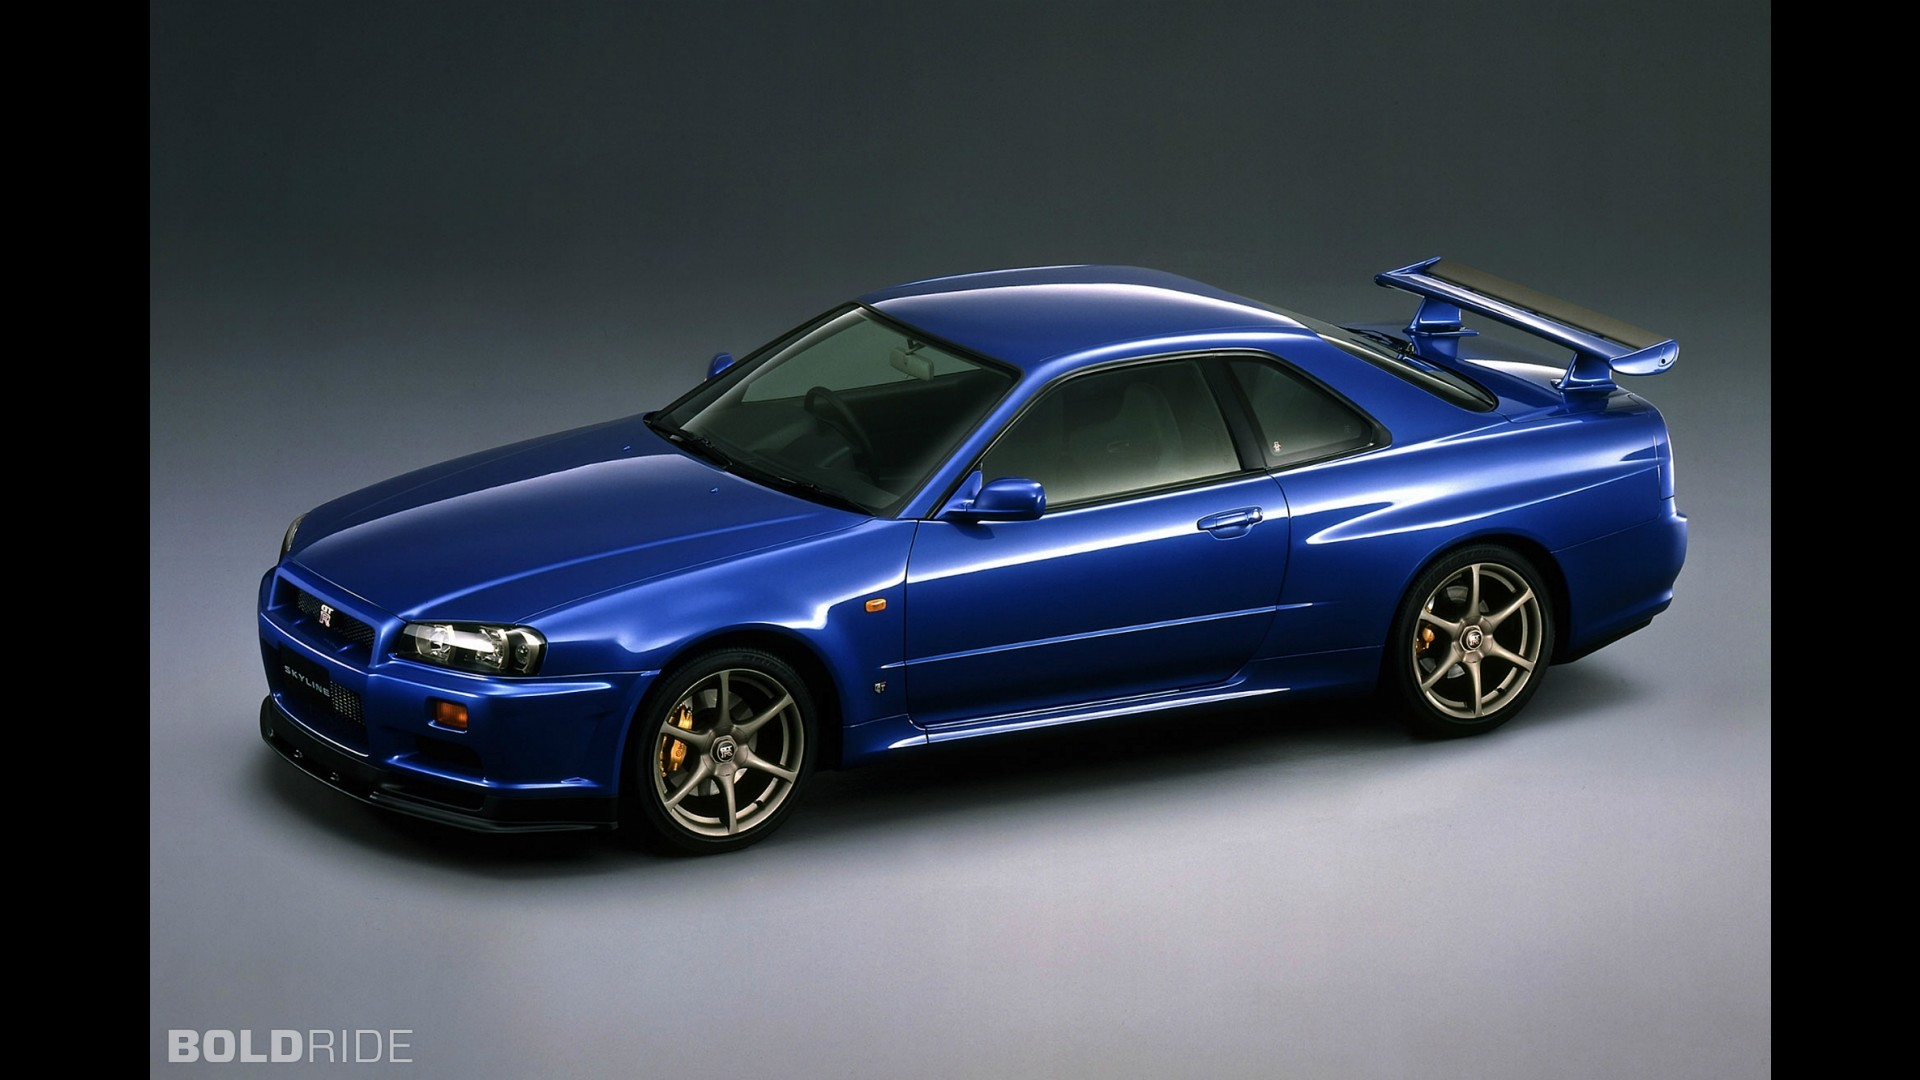 Best Online Website For Used Cars